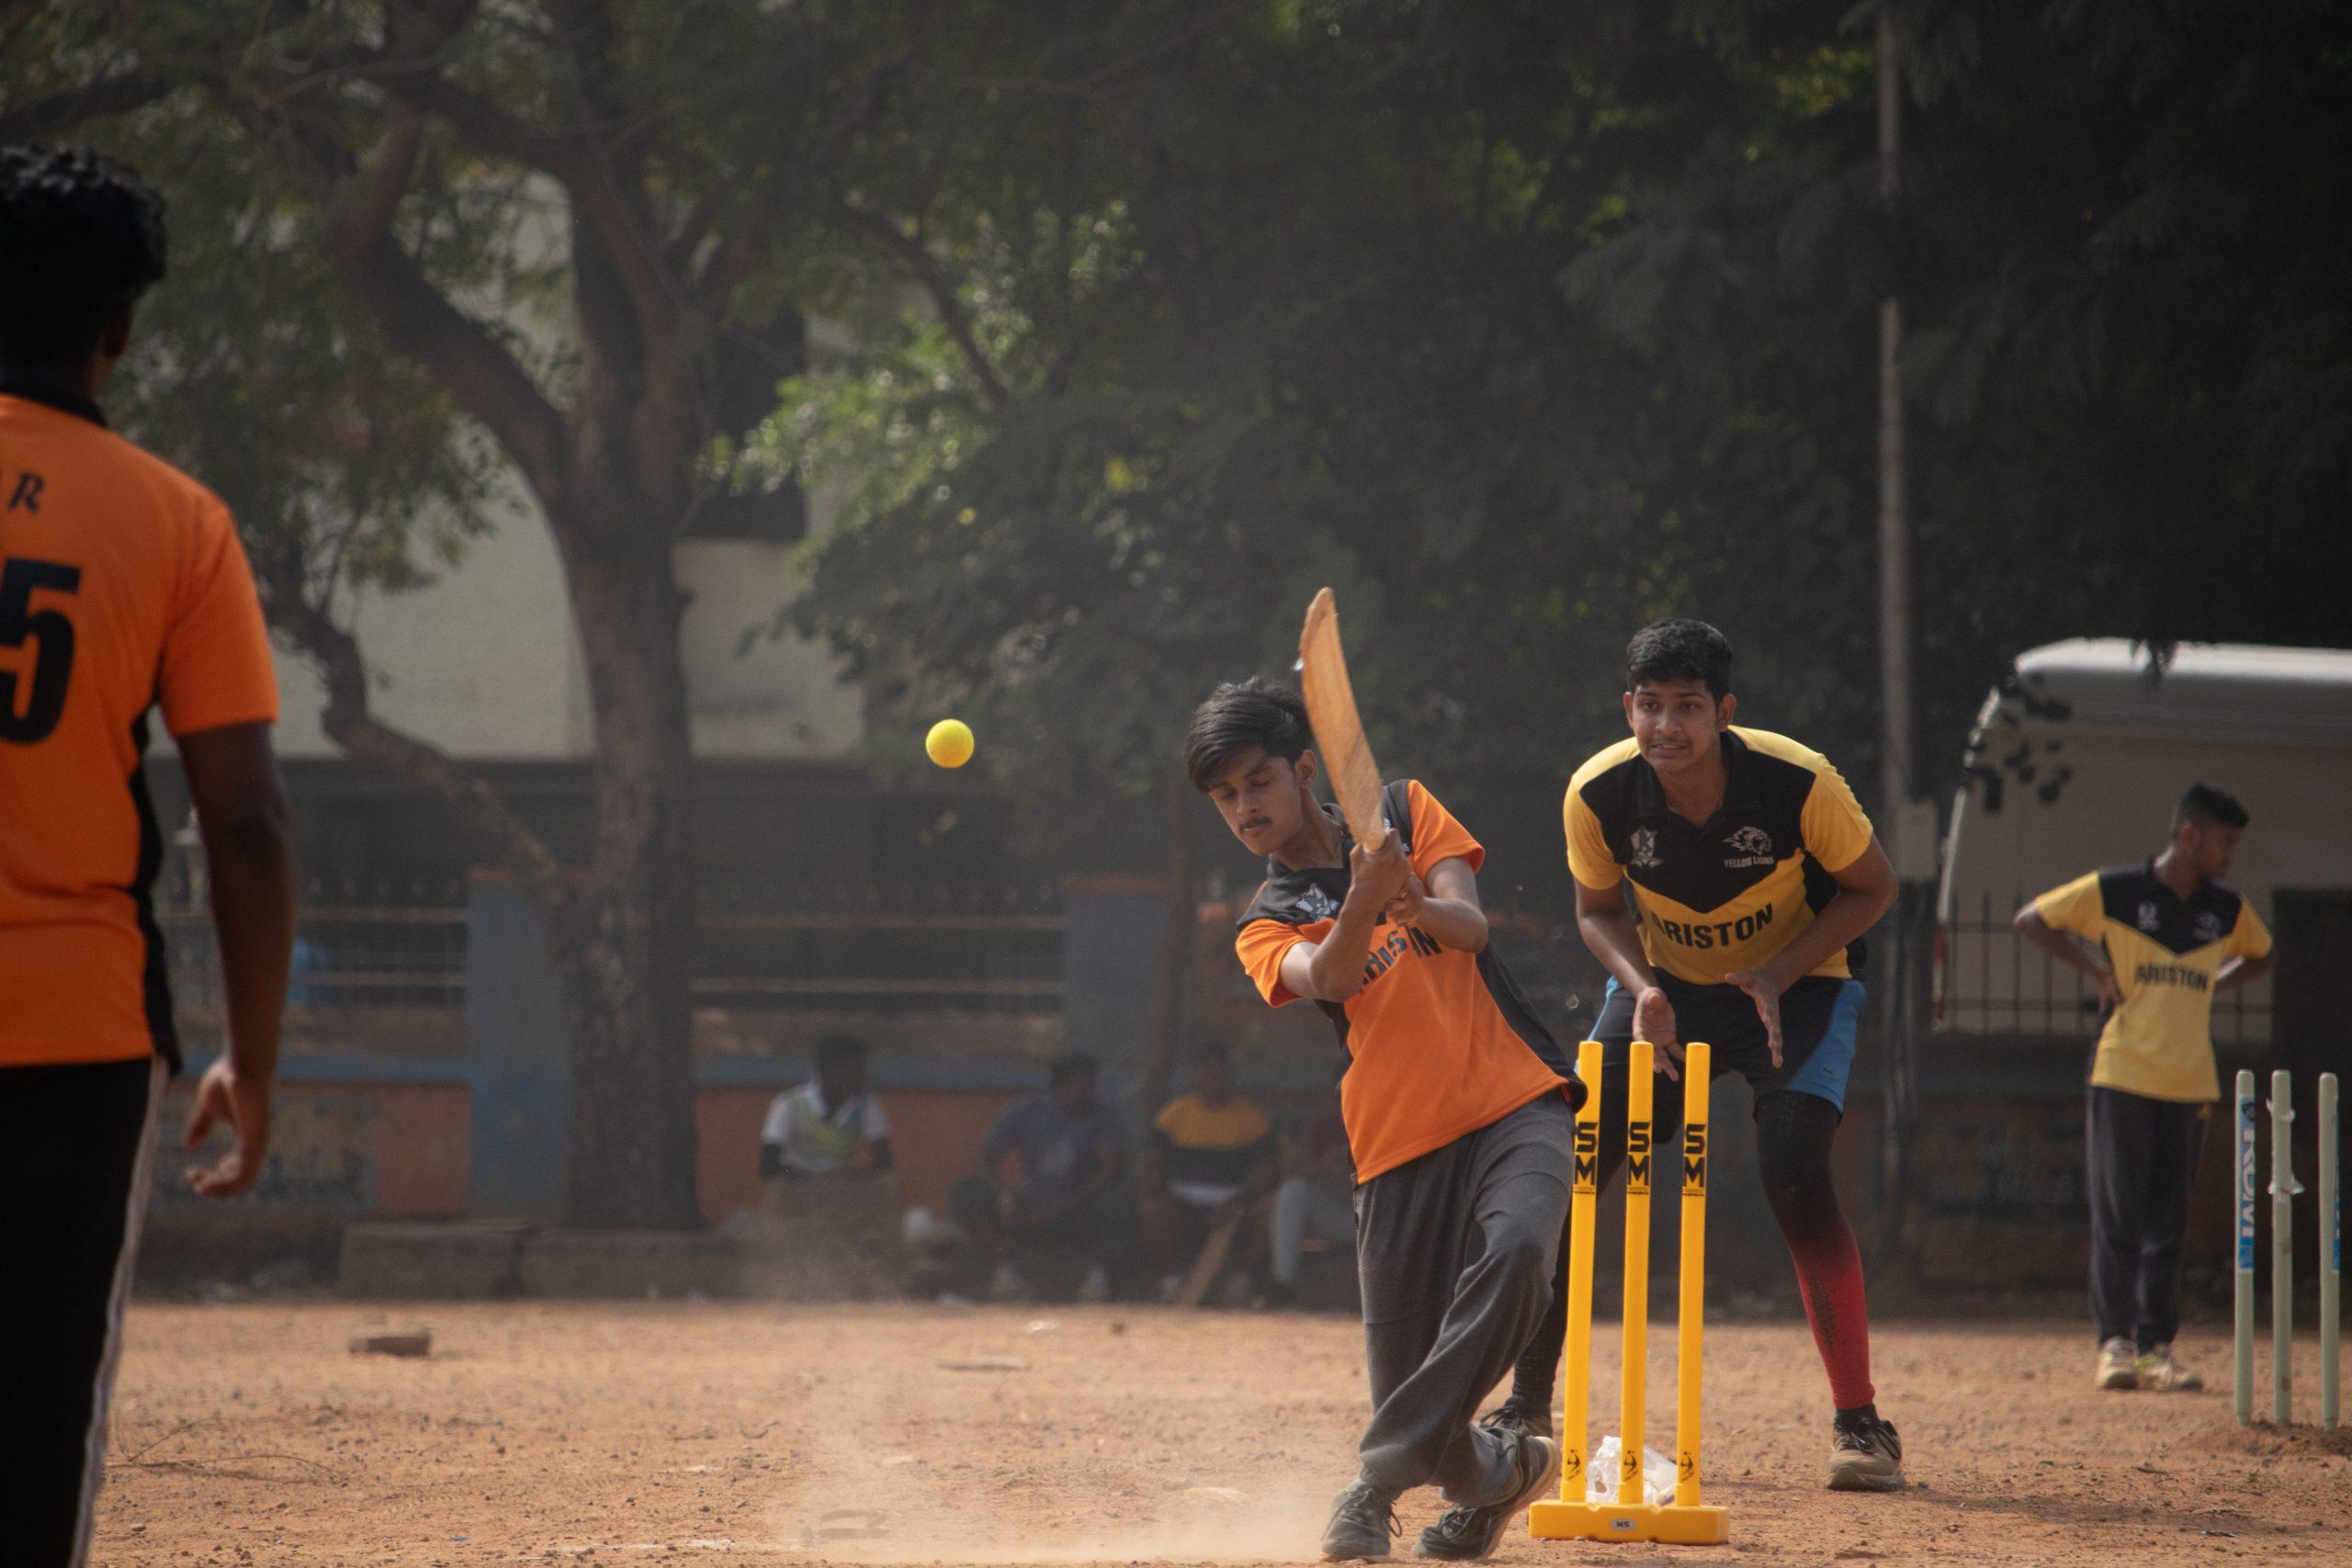 Batsman hitting a ball